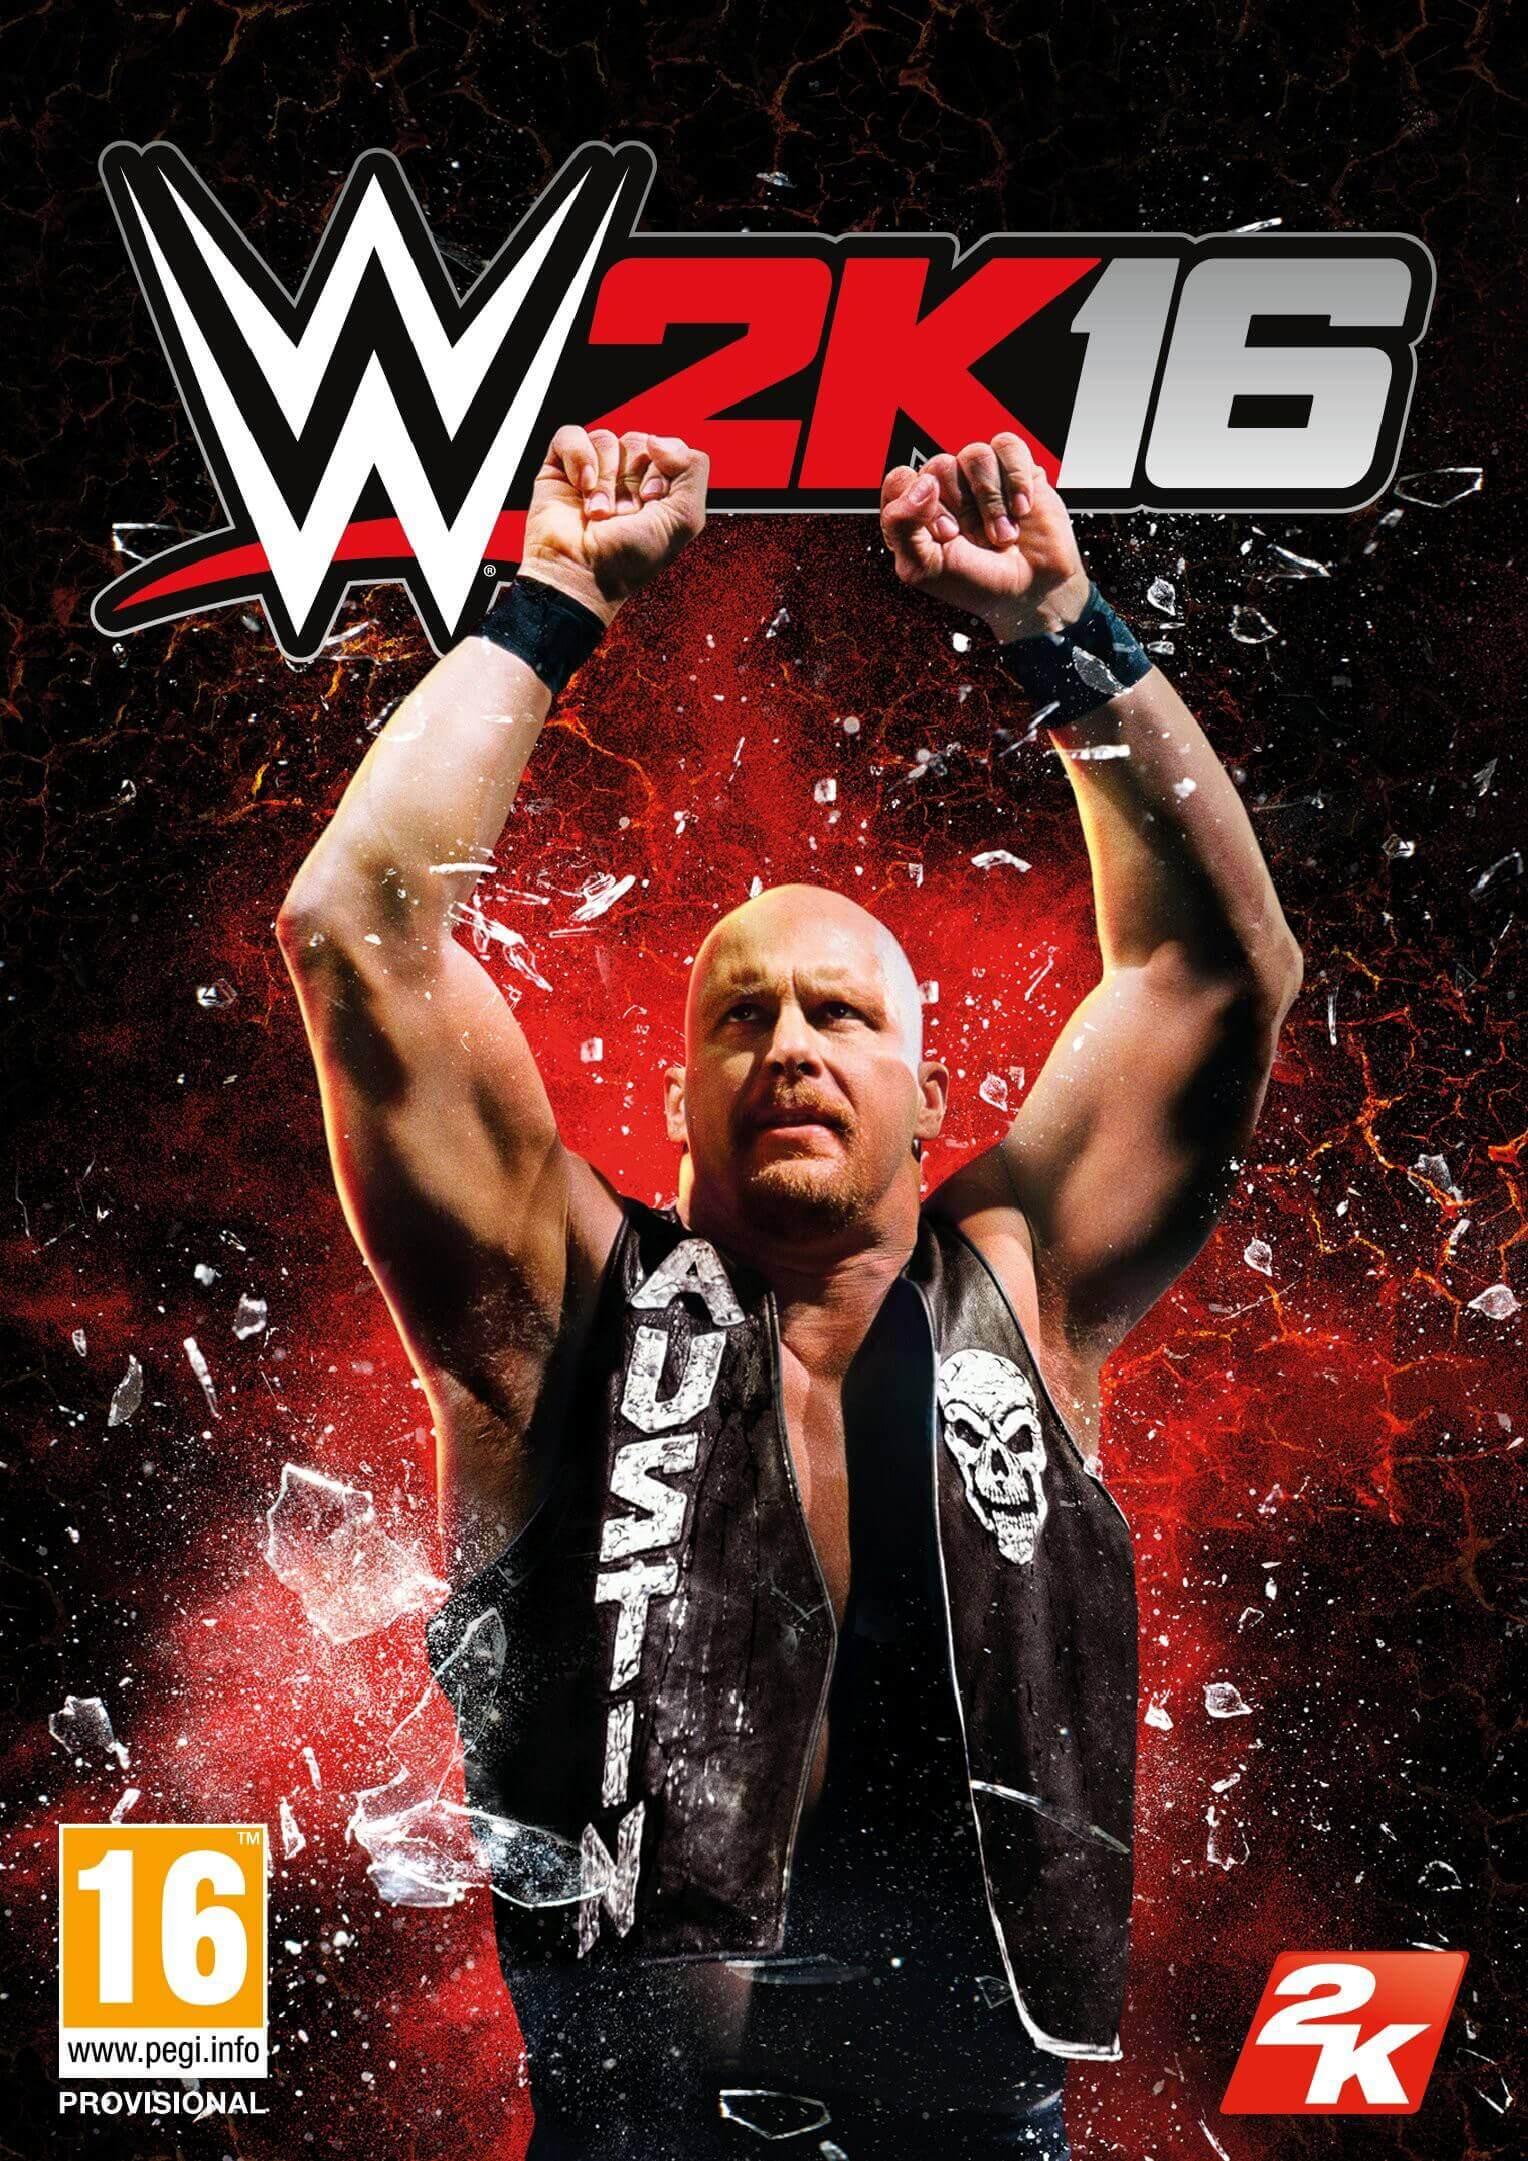 WWE2K16 Download Free Torrent PC + Crack